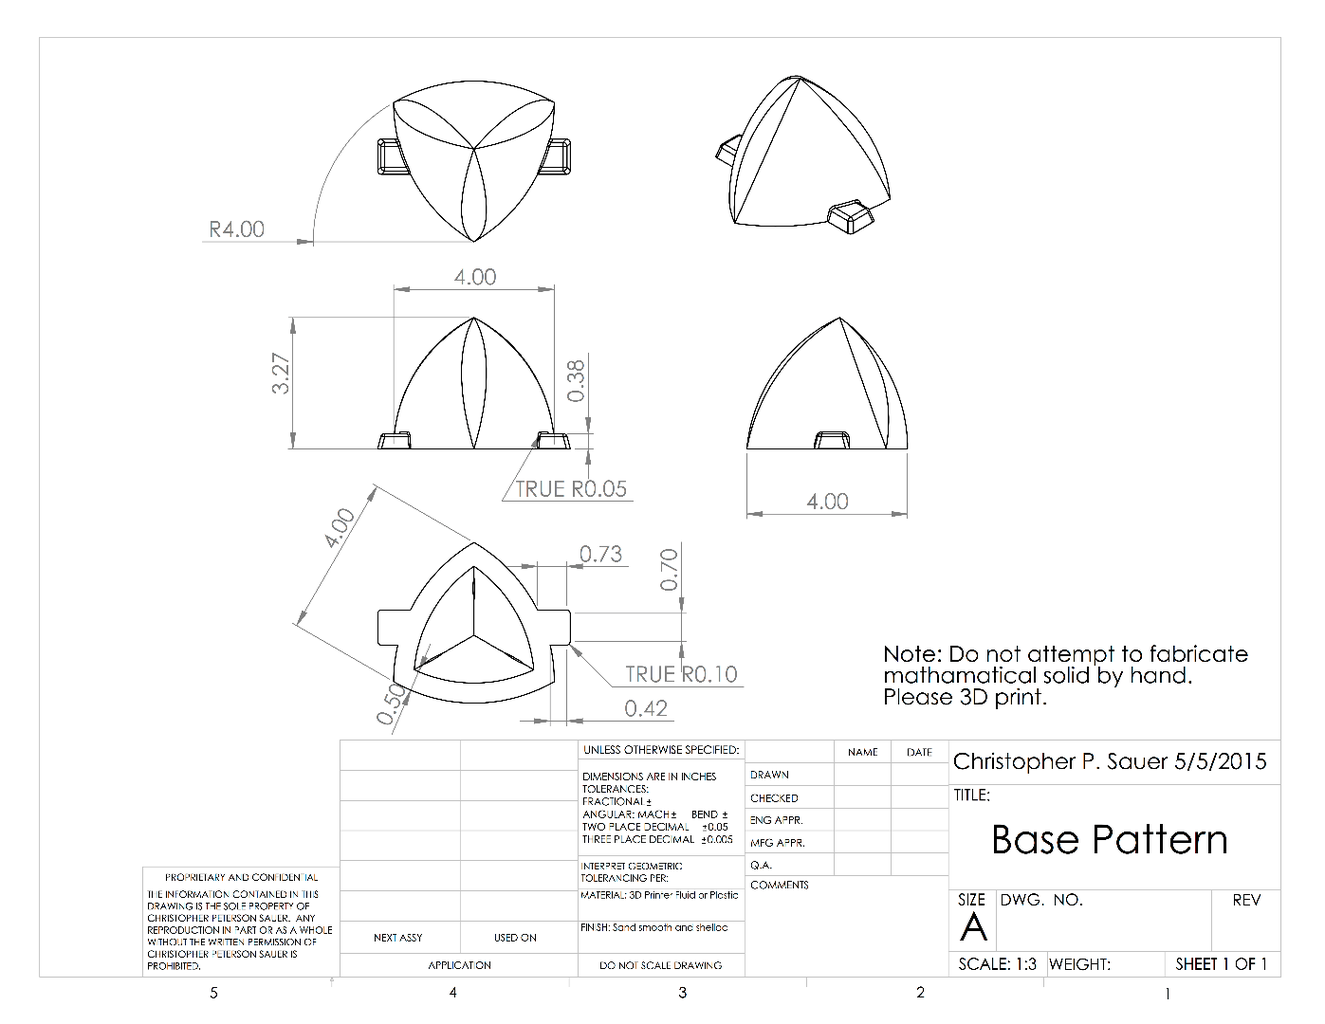 Cutting Triangular Hole in Base (part 2)